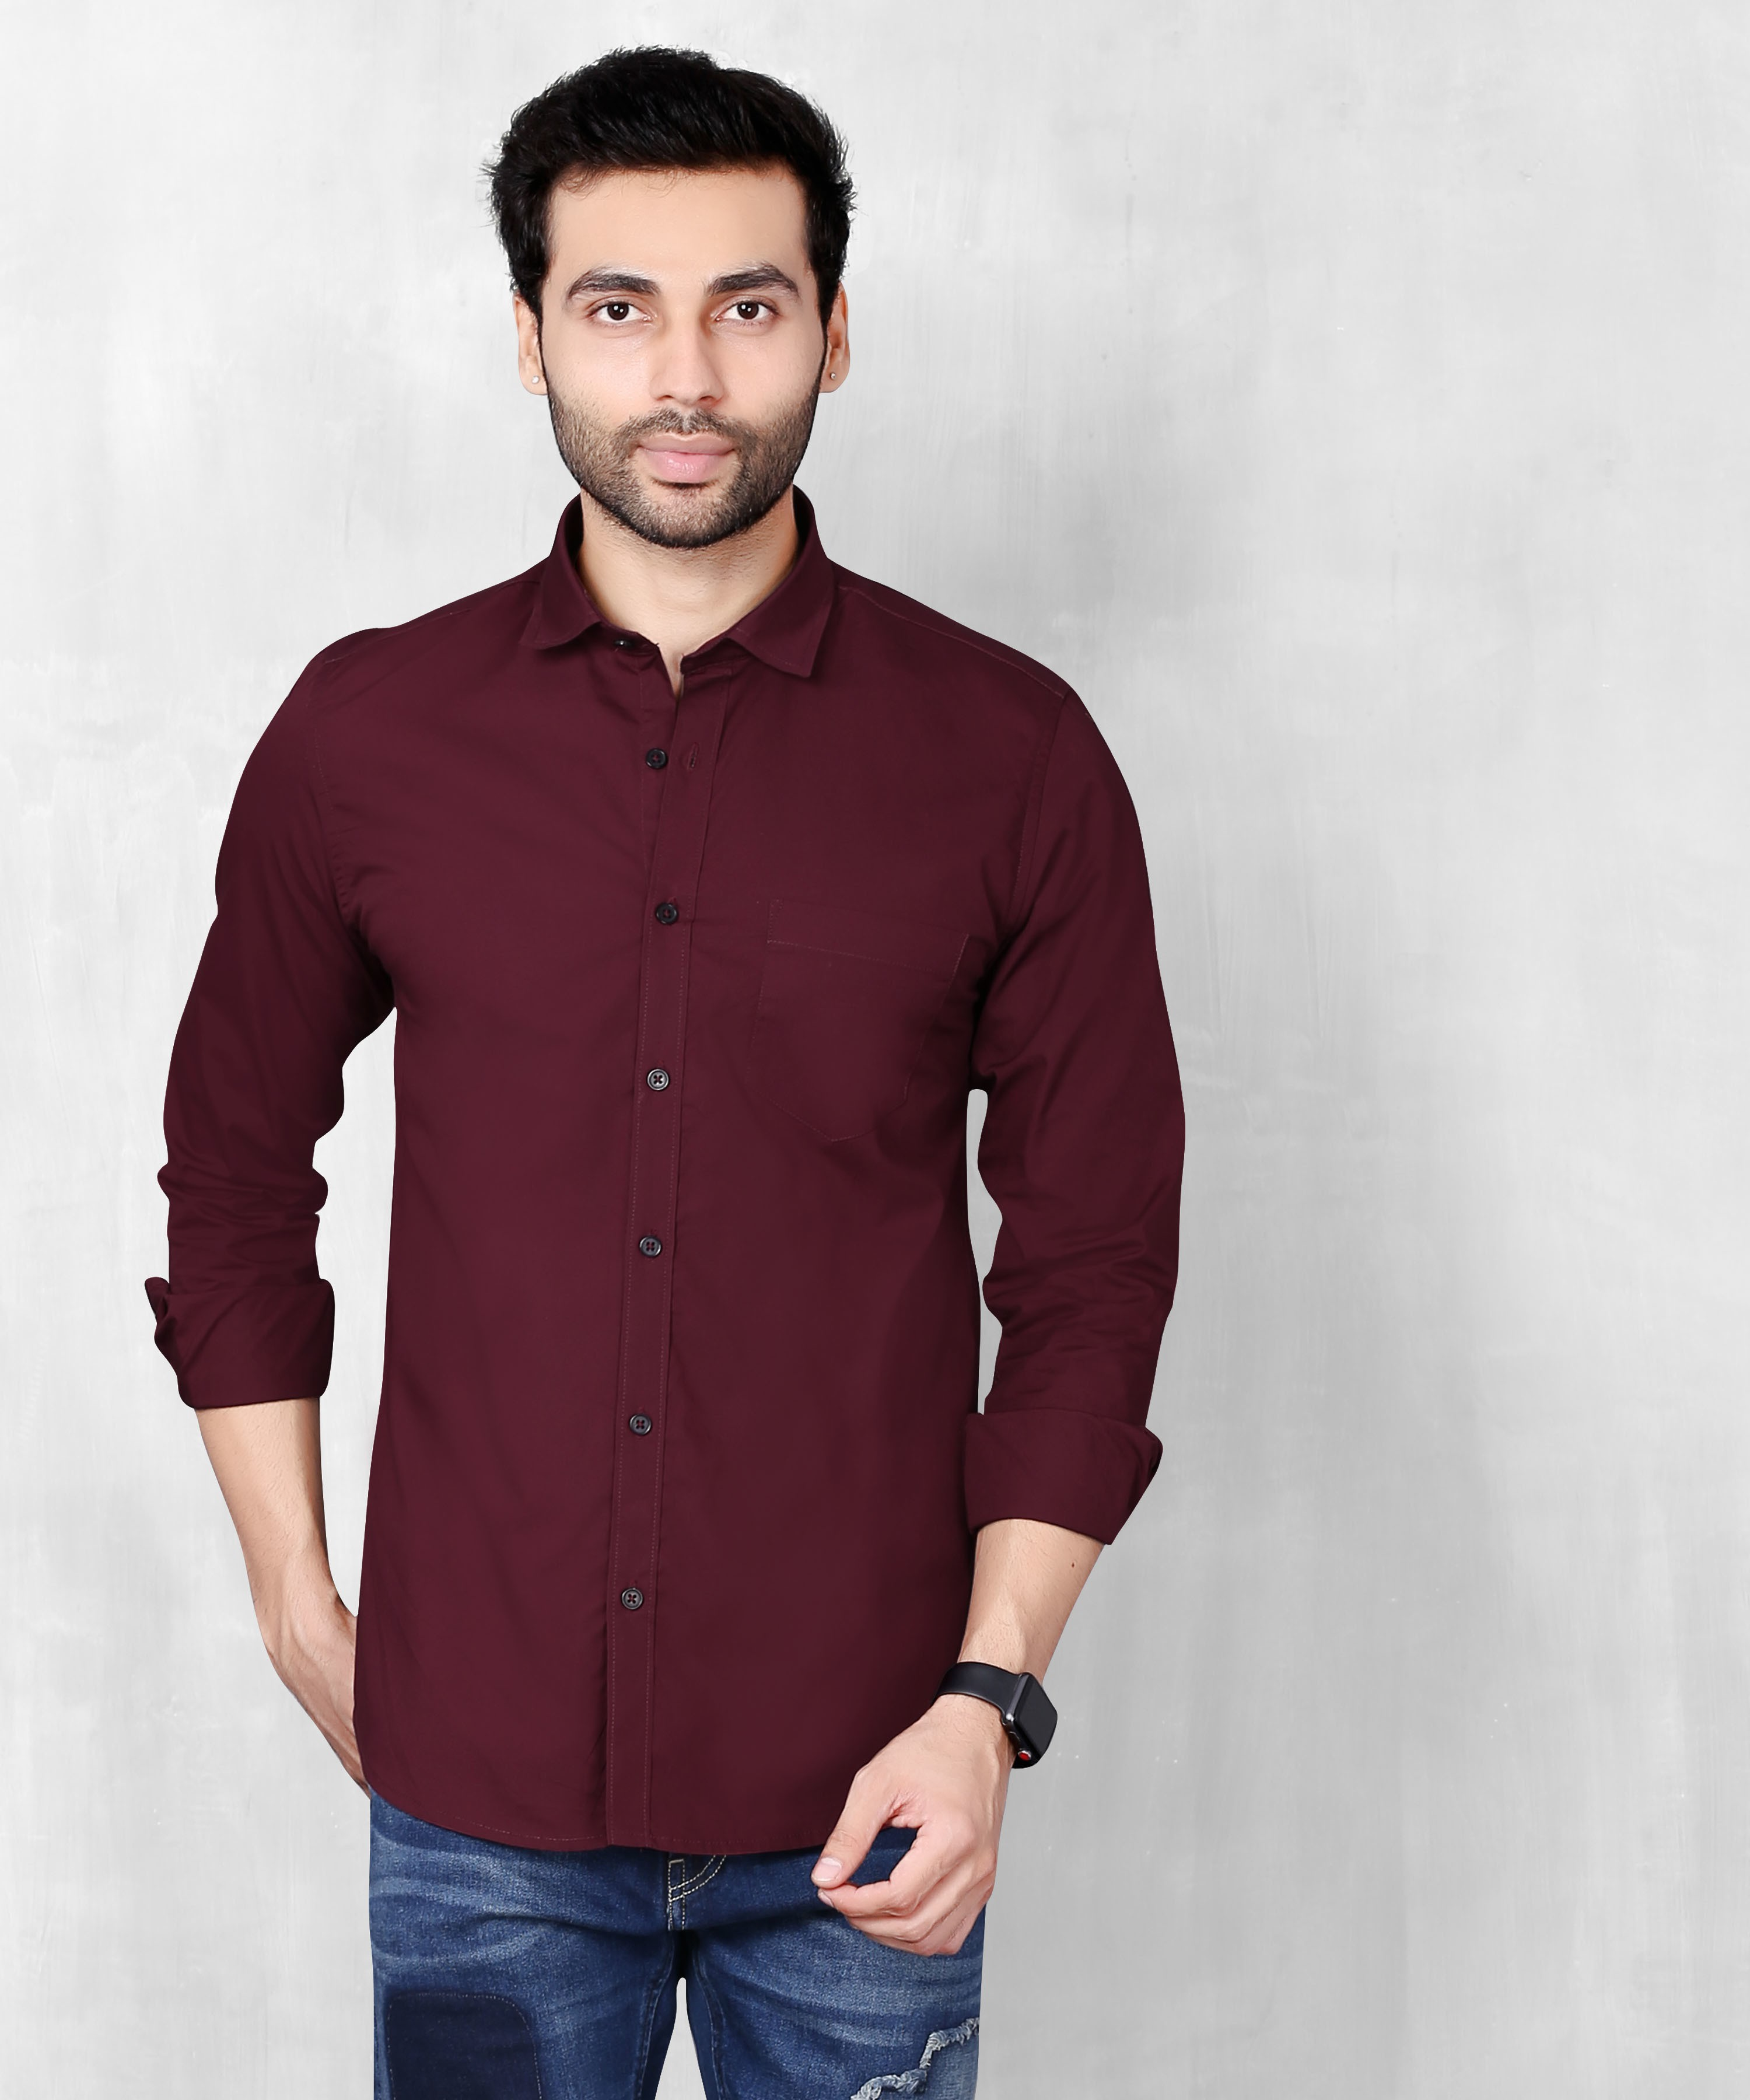 5th Anfold | FIFTH ANFOLD Men's Maroon Casual Slim Collar Full/Long Sleev Slim Fit Shirt